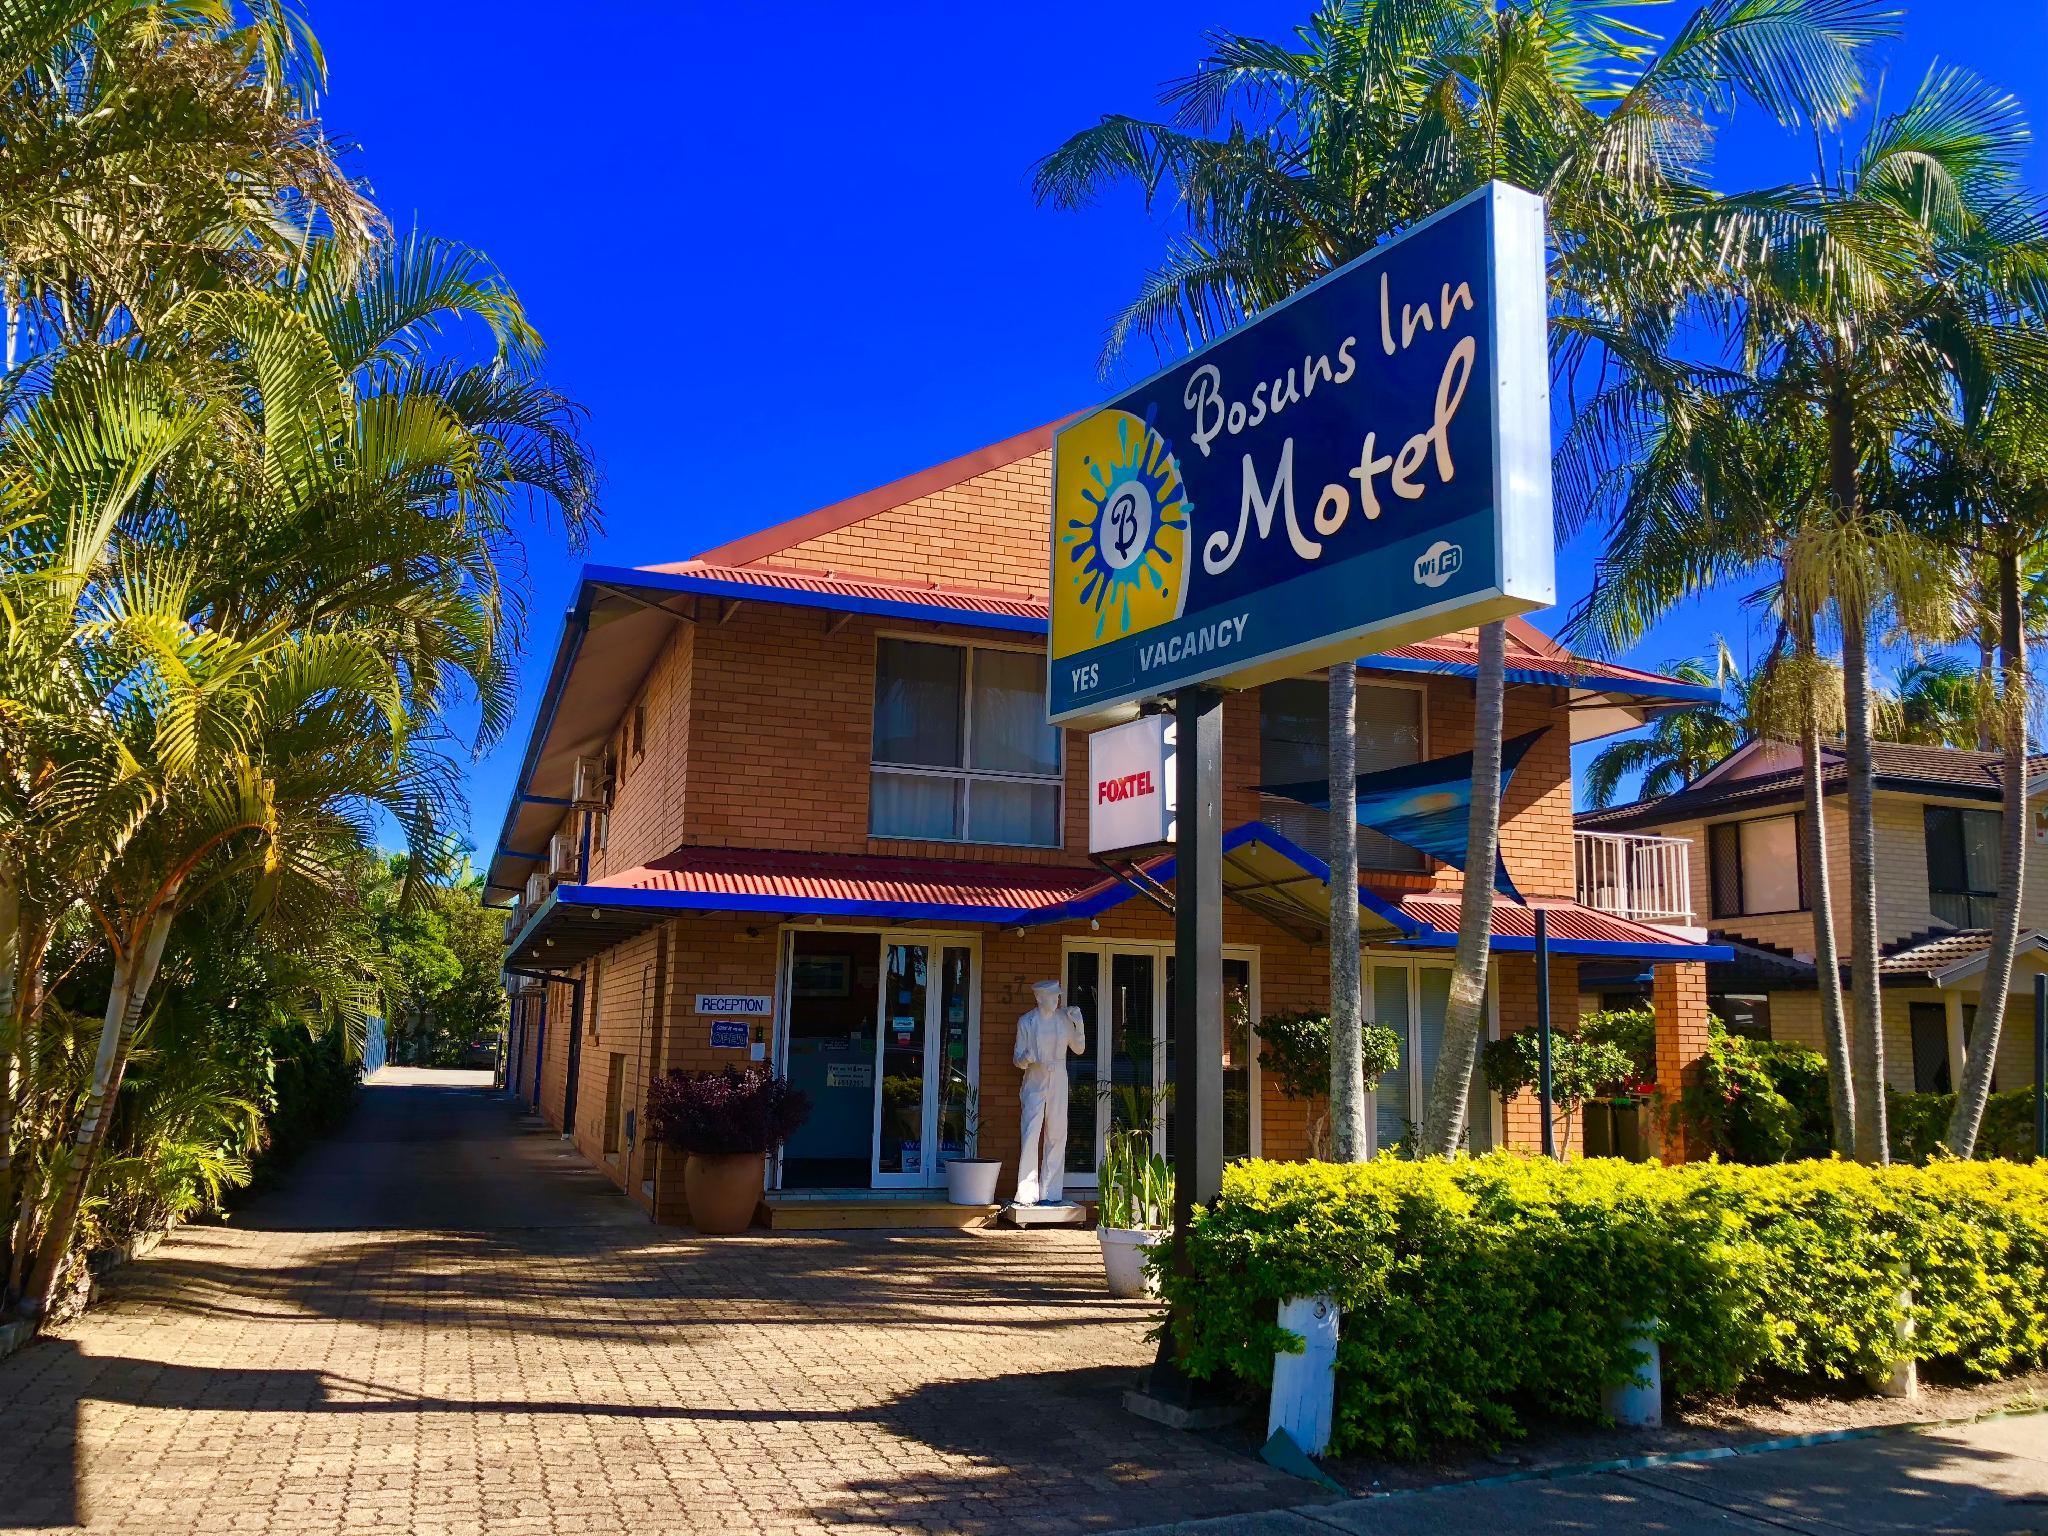 Bosuns Inn Motel